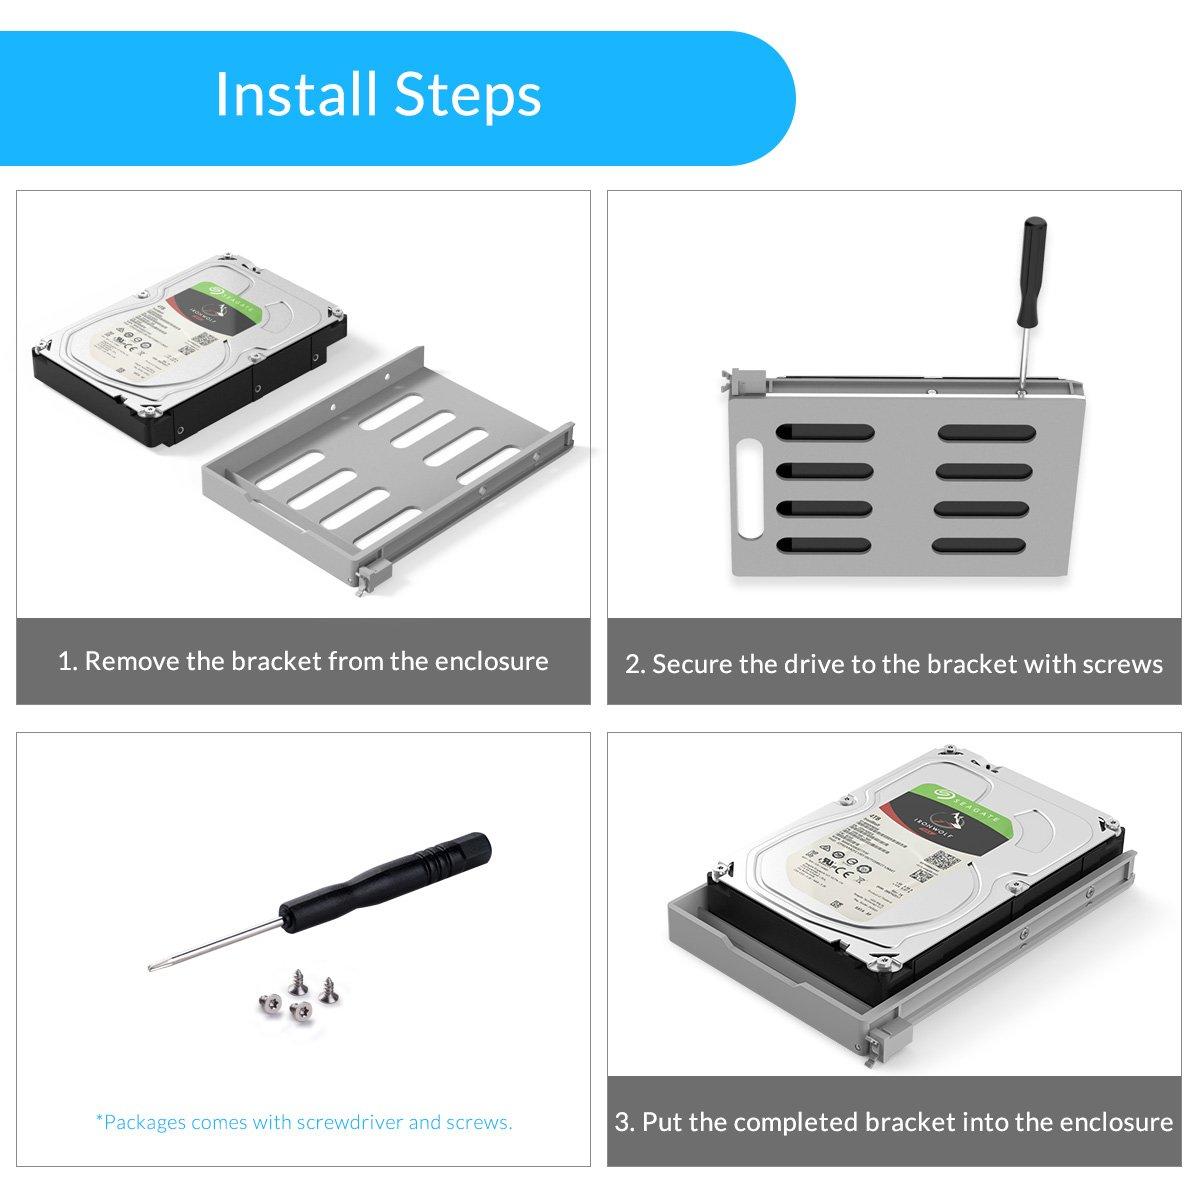 Yottamaster Aluminum Alloy 5 Bay 3.5 Inch USB3.1 Gen1 Type-C RAID External HDD Enclosure SATA3.0 Support 5x10TB & UASP -Silver by Yottamaster (Image #6)